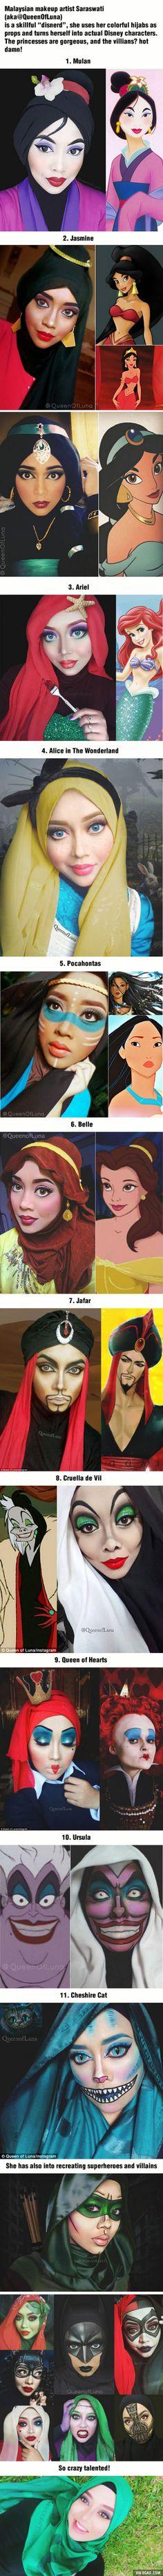 Malaysian Makeup Artist Transforms Into Stunning Disney Characters Using Her Hijab on 9GAG